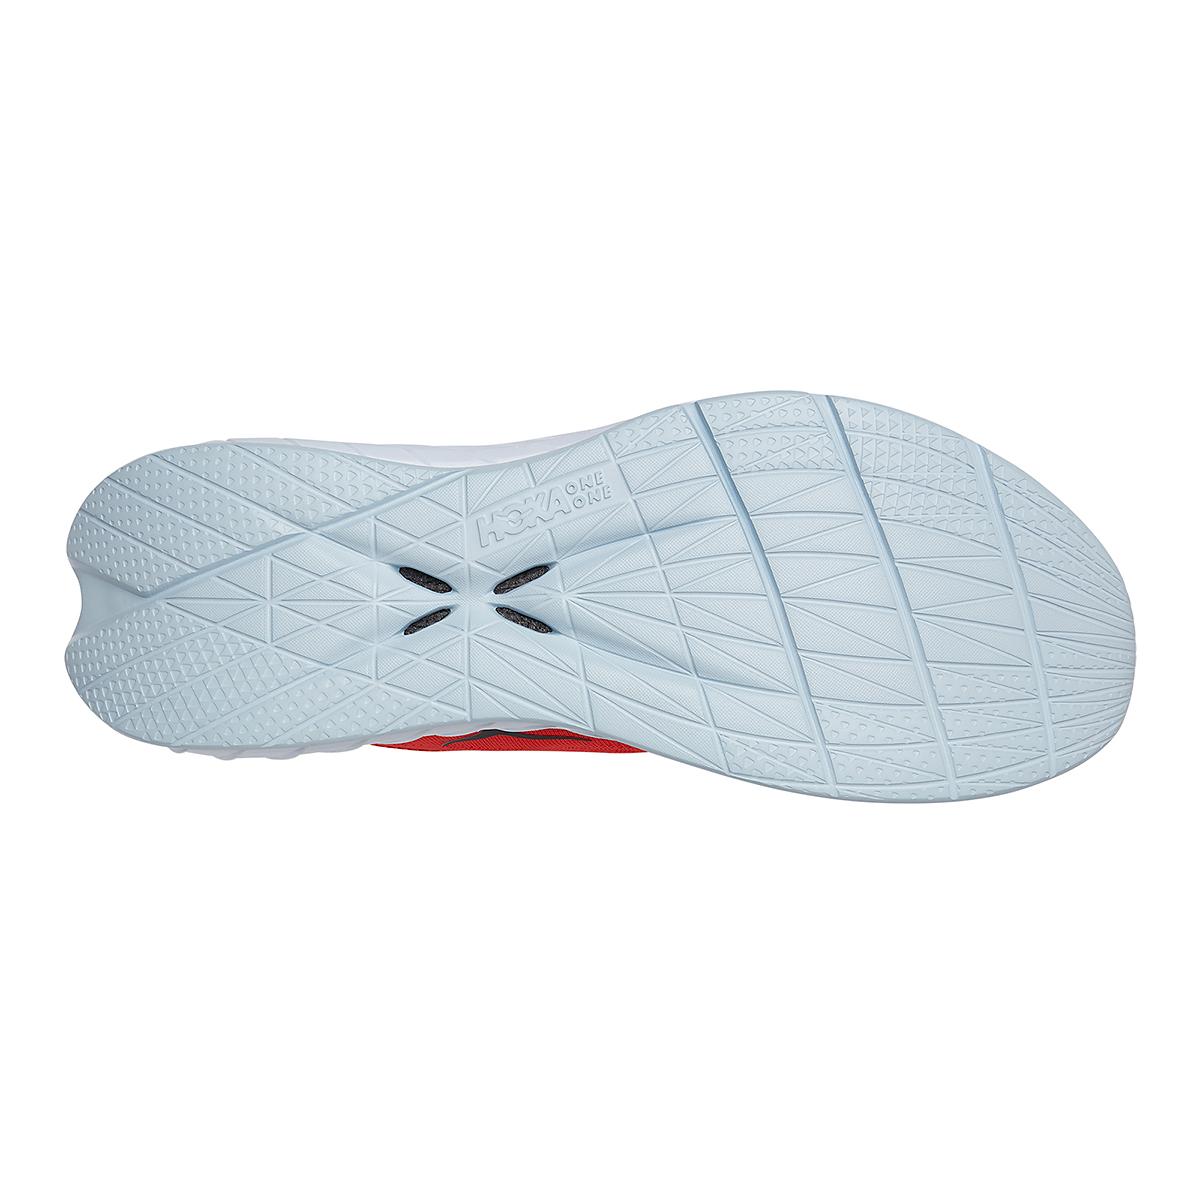 Men's Hoka One One Carbon X 2 Running Shoe - Color: Fiesta/White - Size: 9 - Width: Regular, Fiesta/White, large, image 6